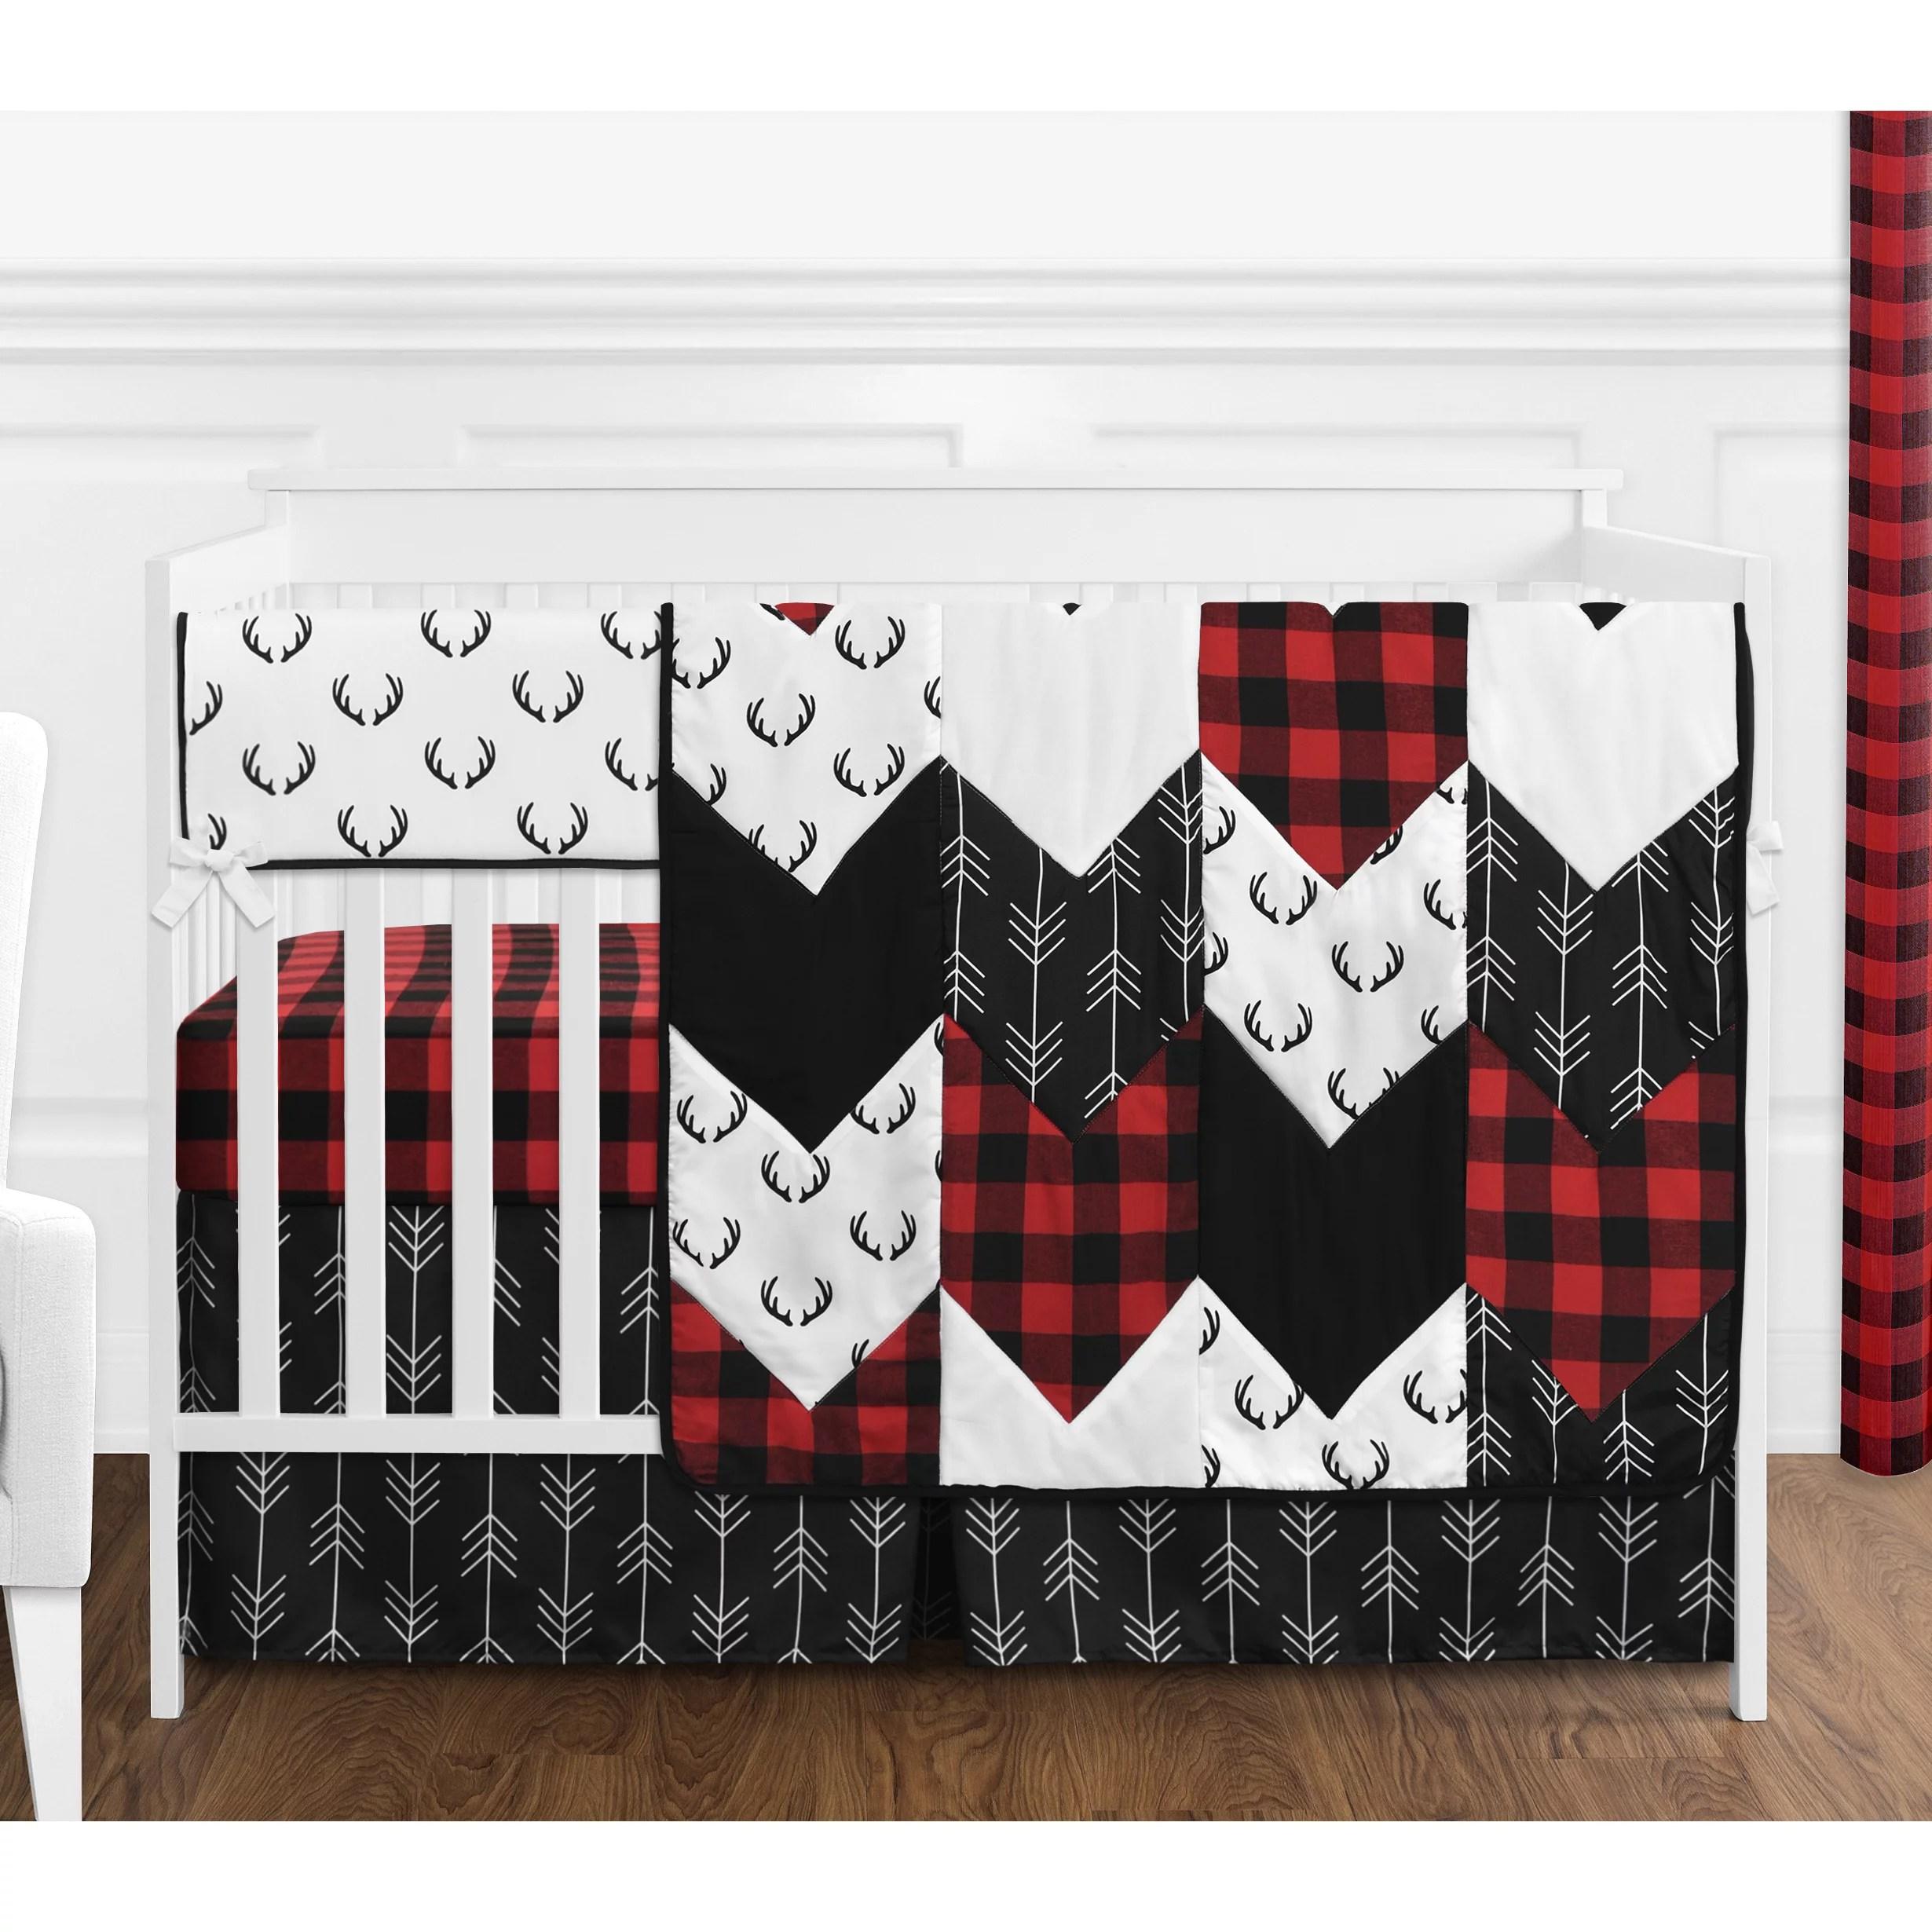 woodland buffalo plaid baby boy crib bedding set 5 pieces red and black rustic country deer lumberjack arrow nursery by sweet jojo designs